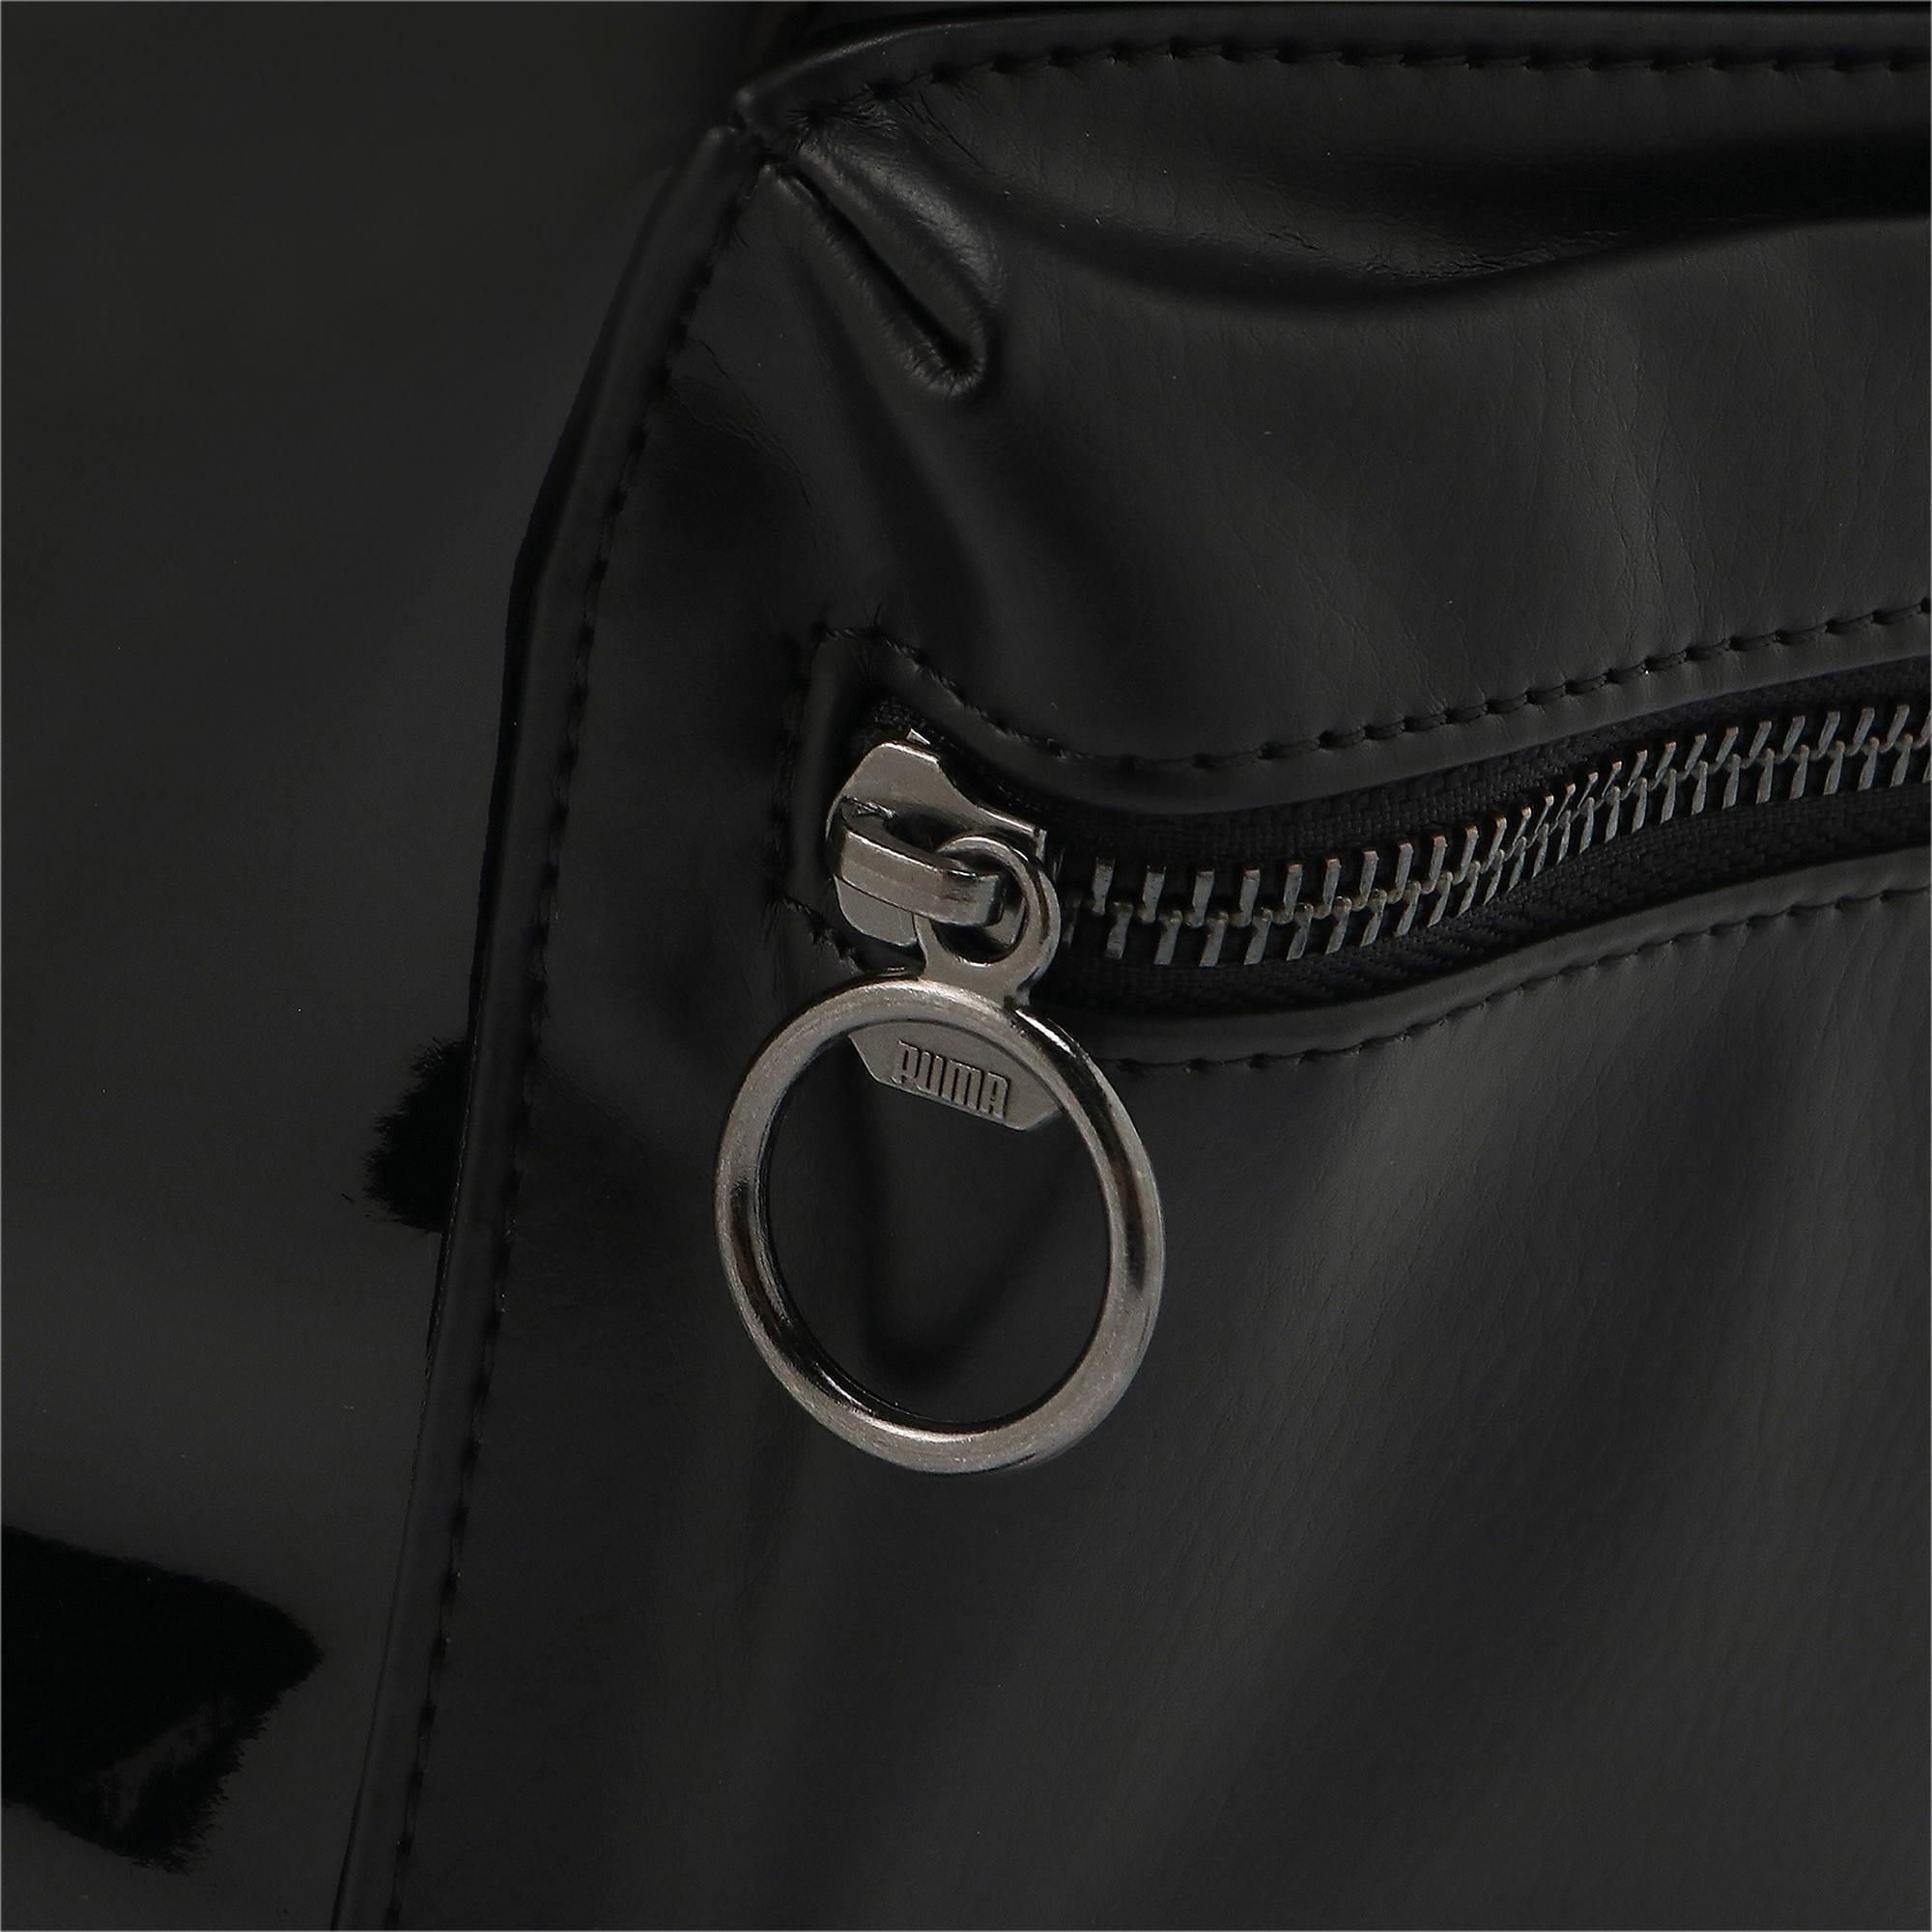 Thumbnail 8 of プライム プレミアム ウィメンズ アーカイブ バックパック 8L, Puma Black, medium-JPN